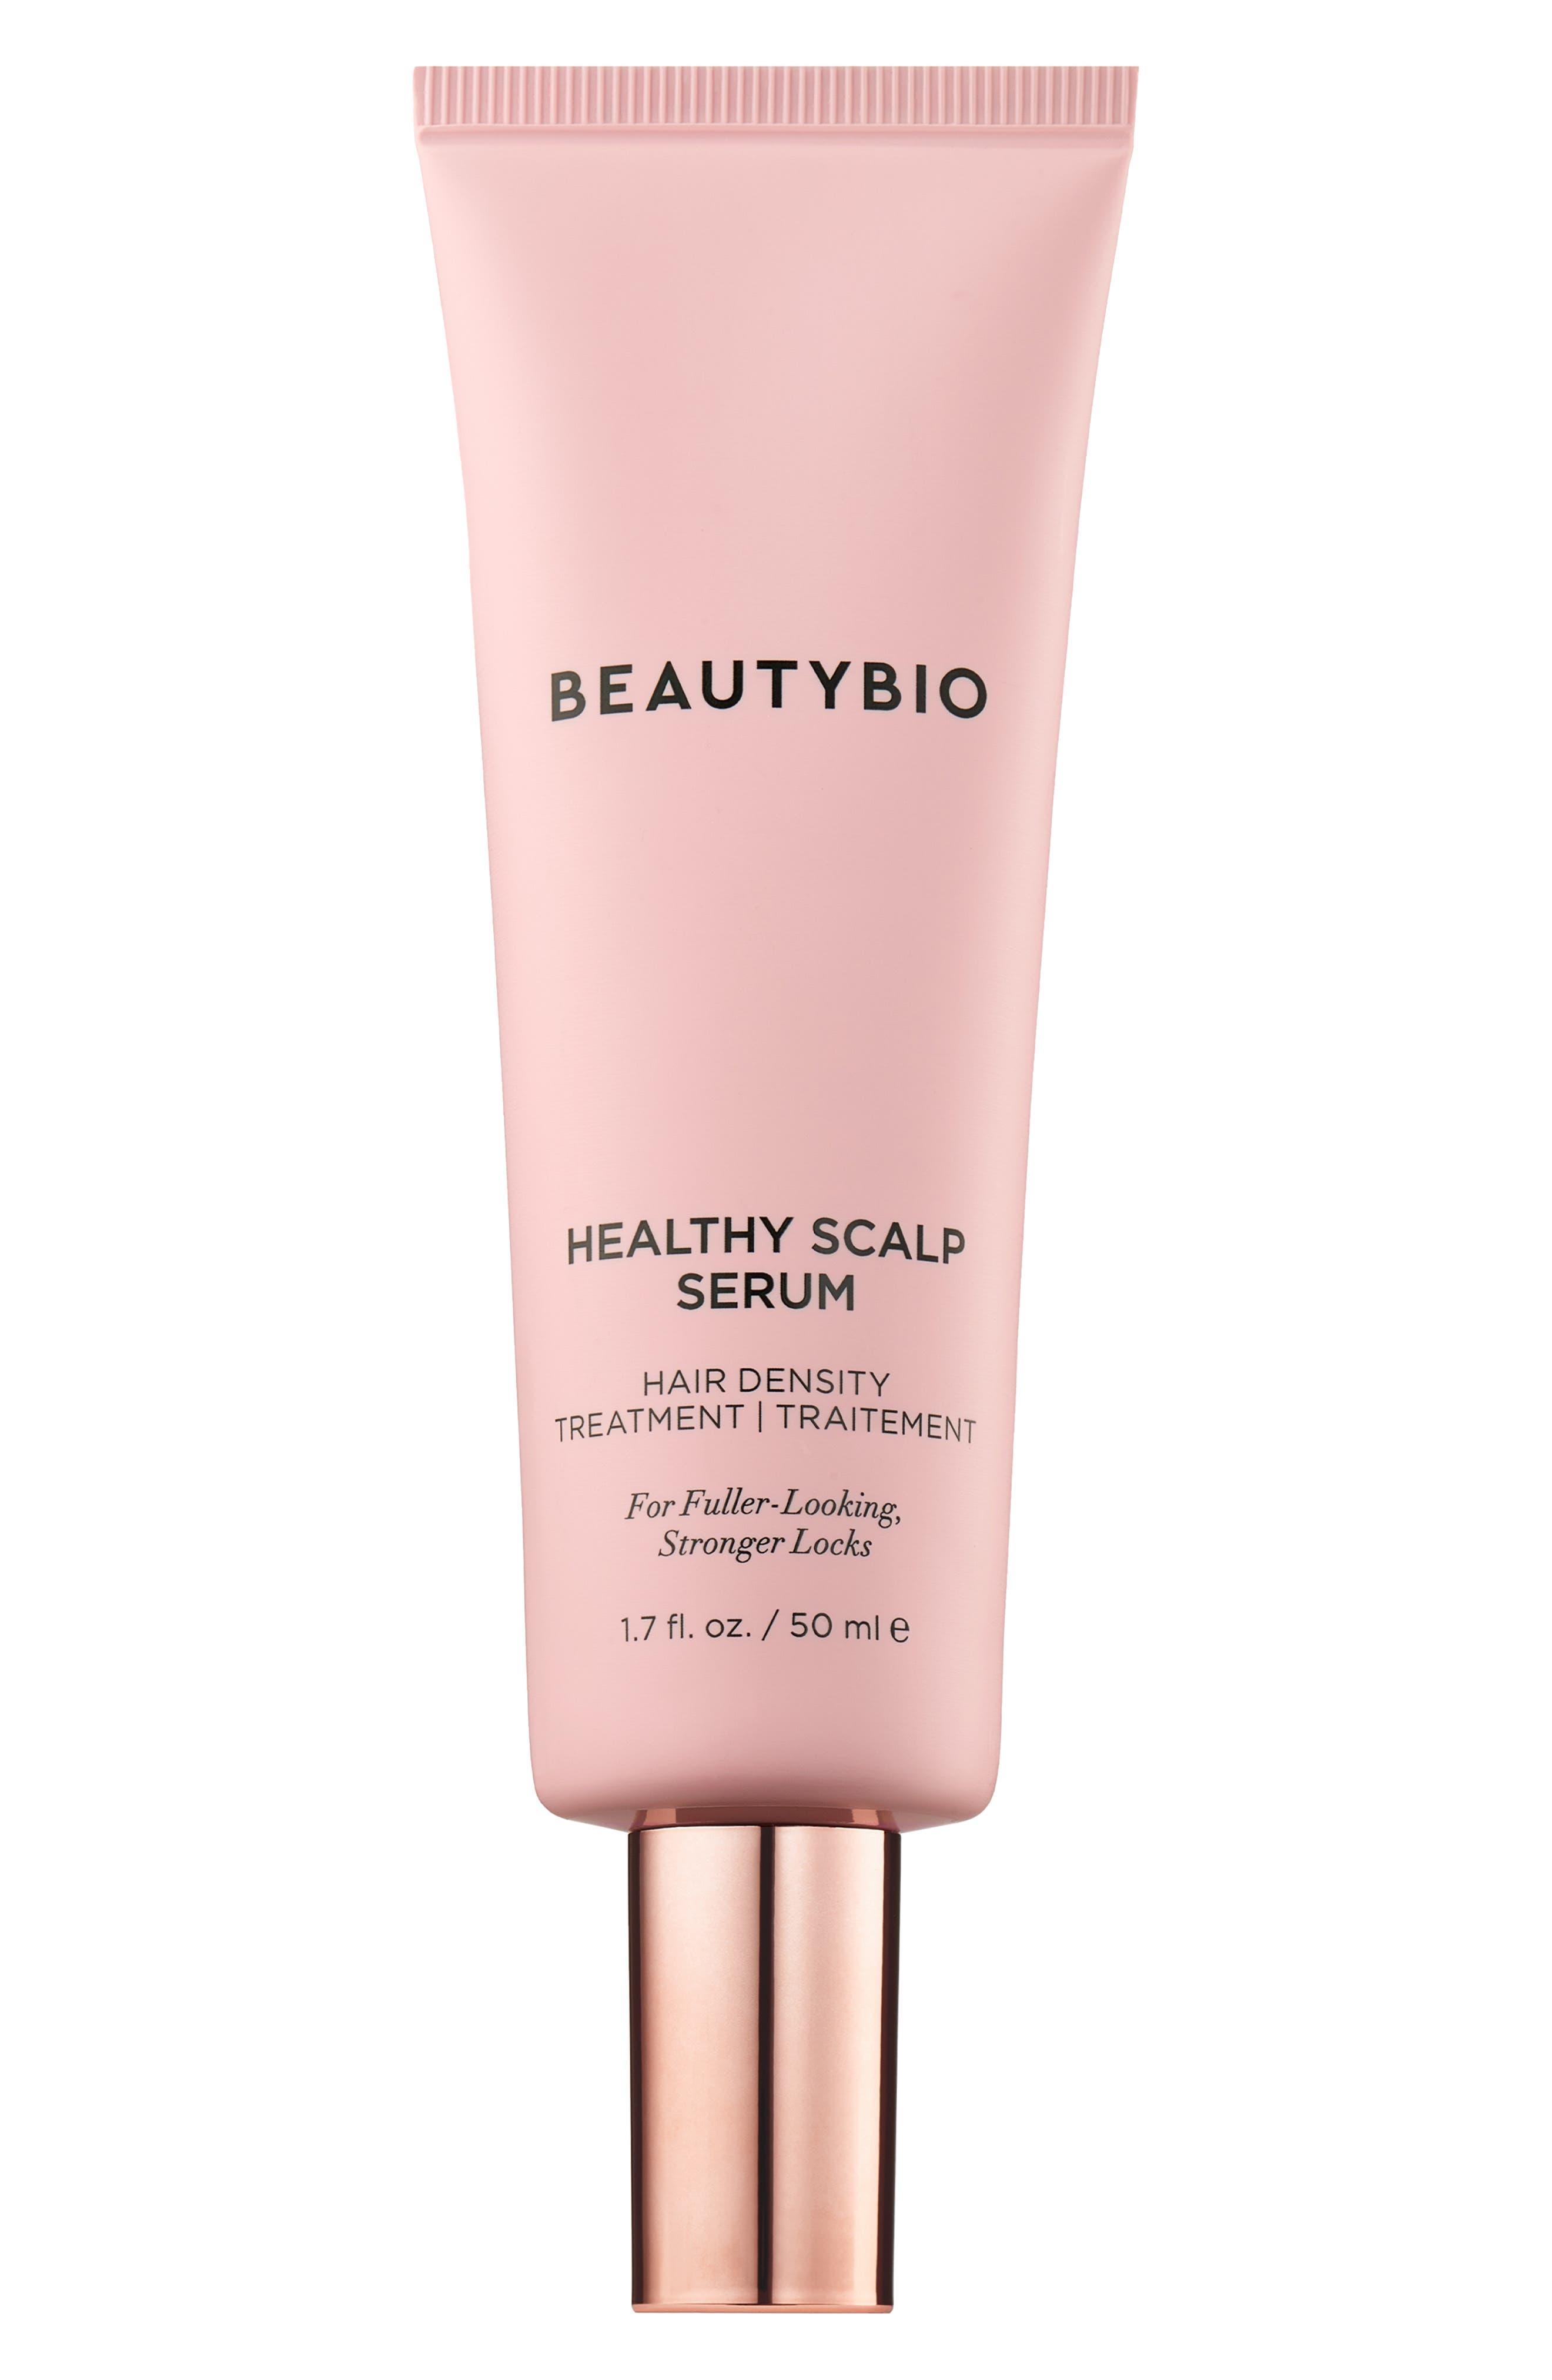 Healthy Scalp Serum Hair Density Treatment